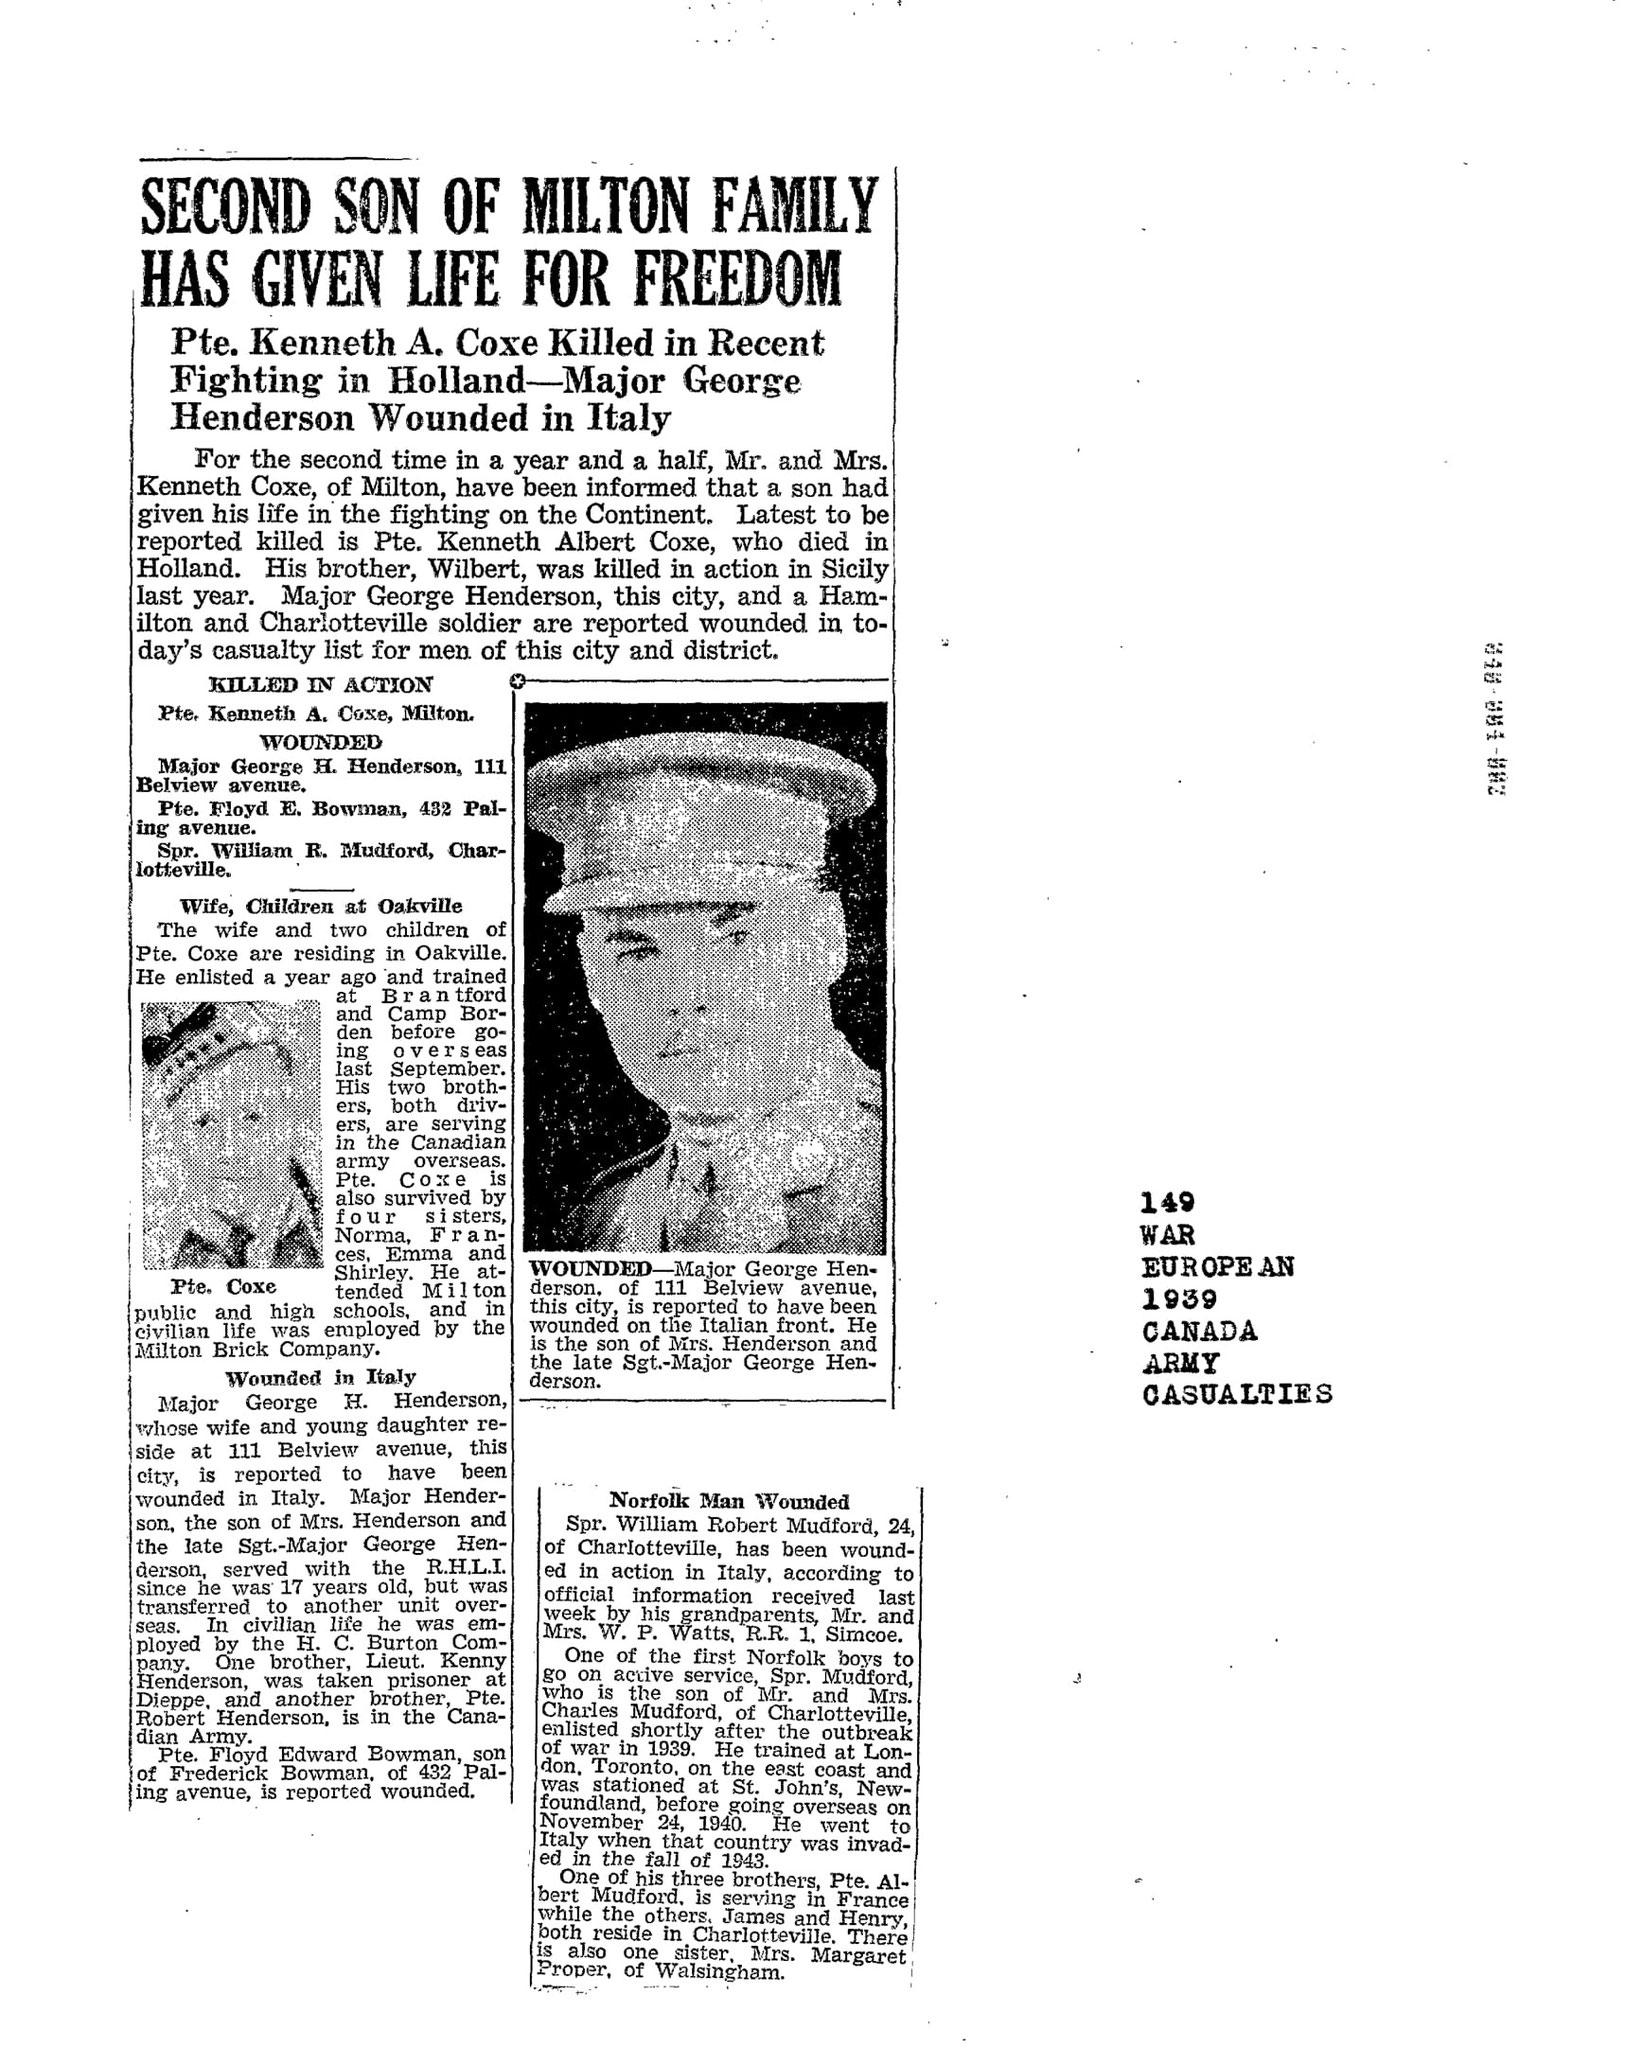 Hamilton Spectator 28-12-1944